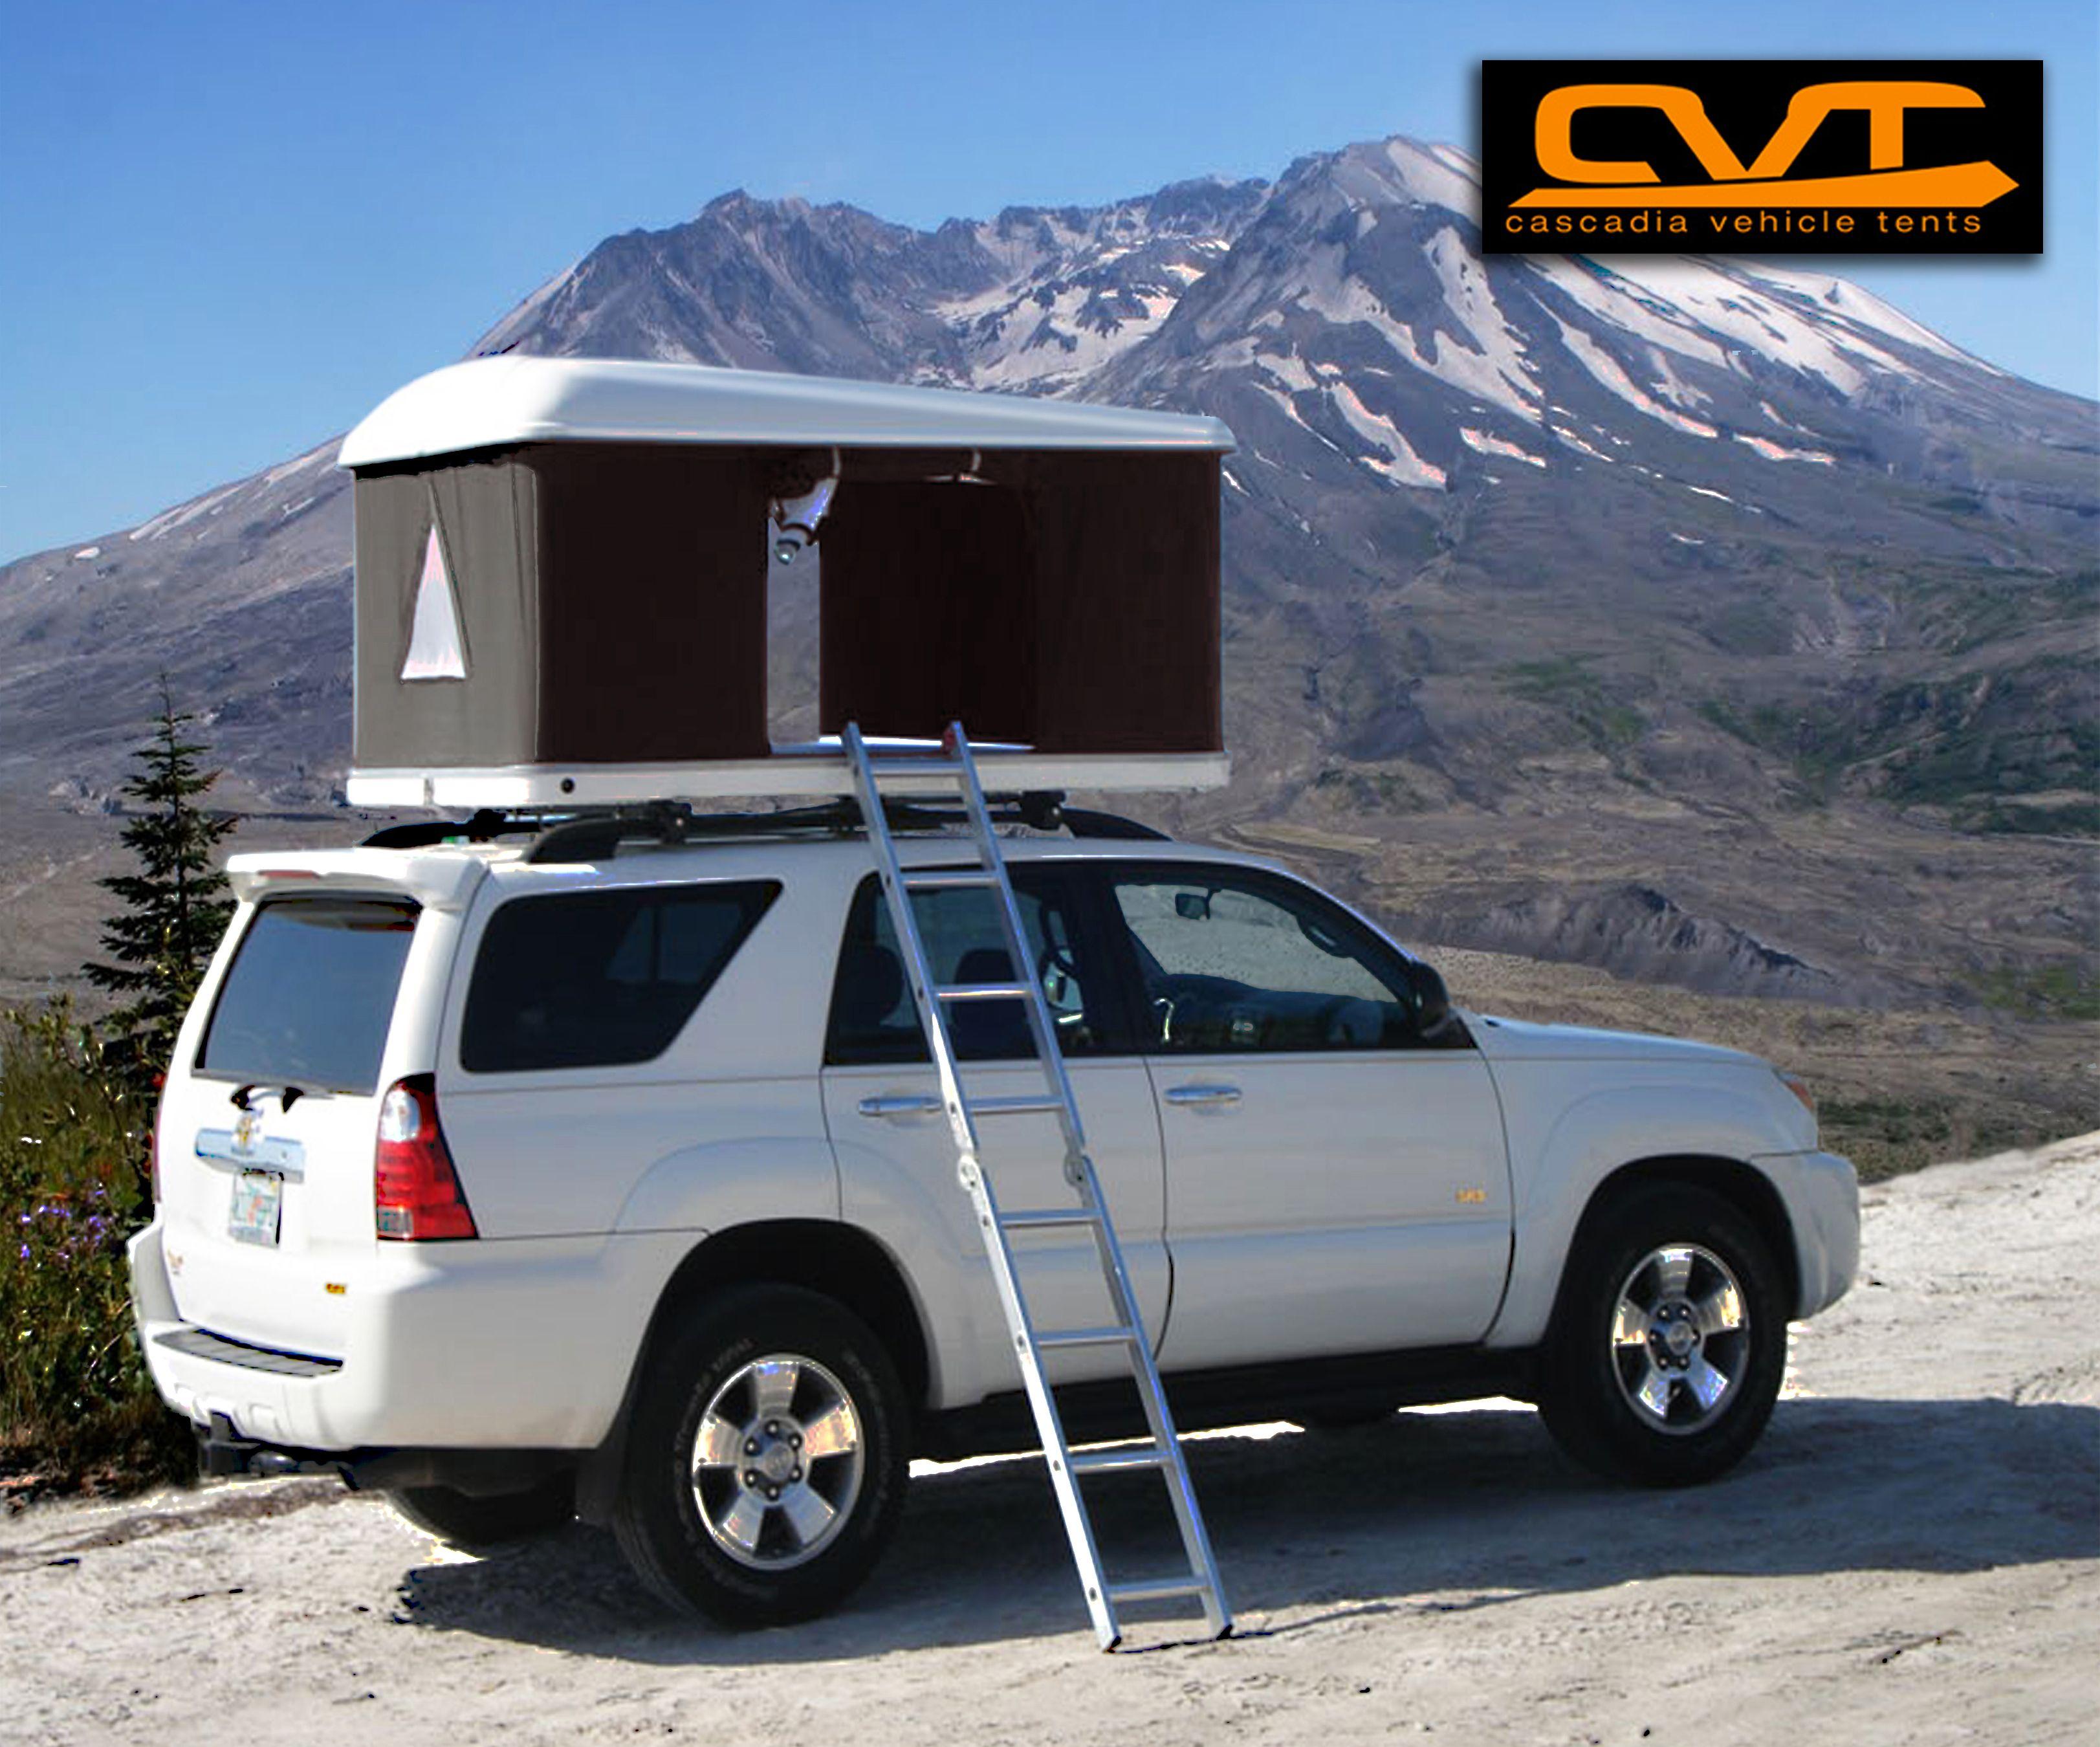 CVT Mt. St. Helens Fiberglass tent. & CVT Mt. St. Helens Fiberglass tent. | Cascadia Vehicle Roof Top ...